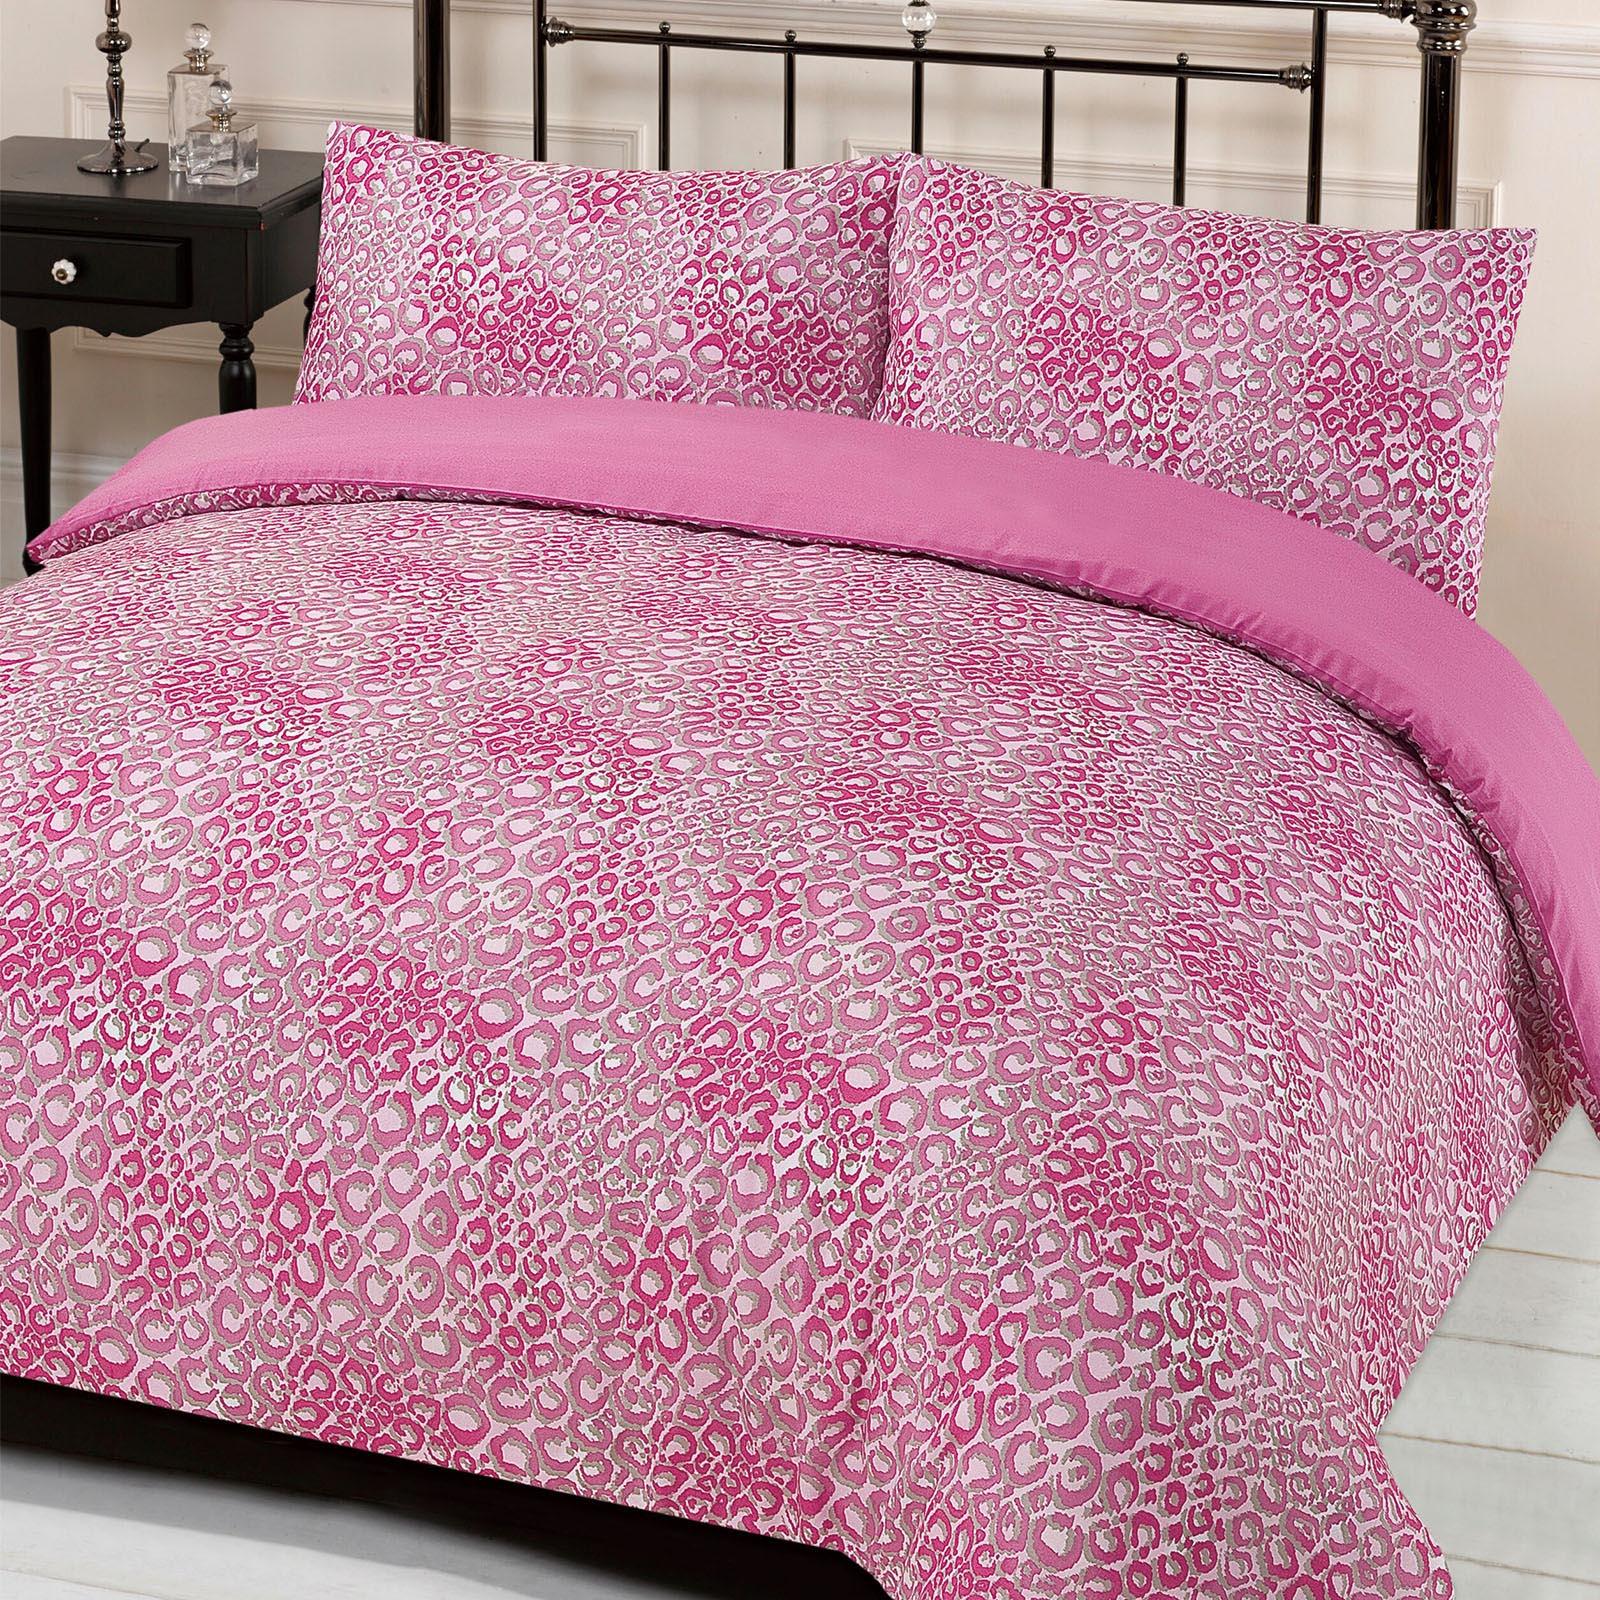 Leopard Print Quilt Cover With Pillowcase Duvet Bedding